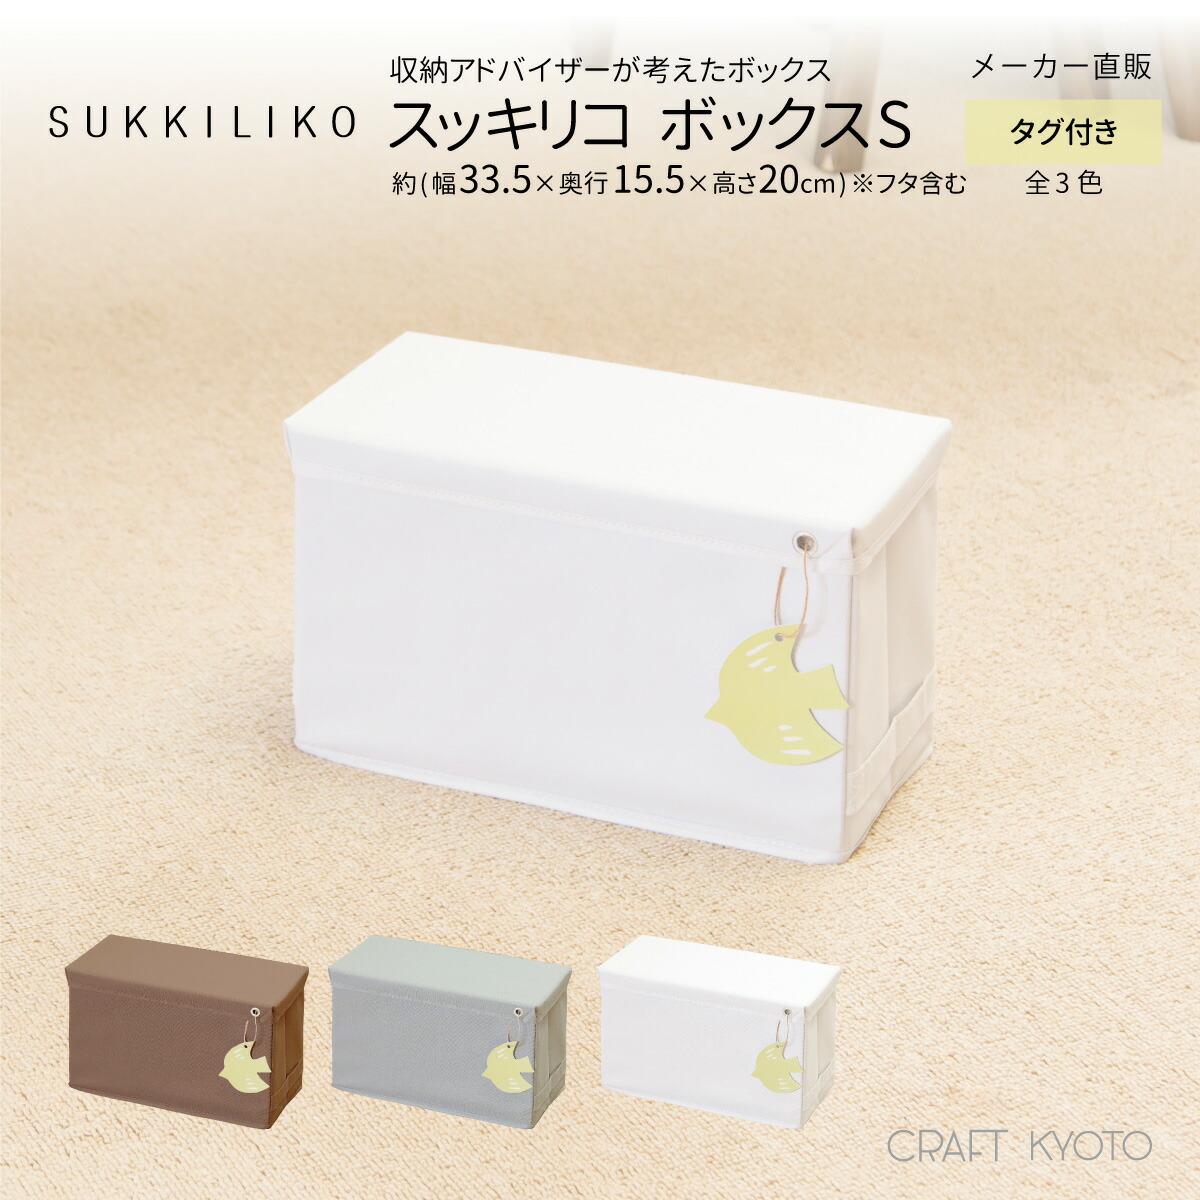 SUKKILIKO スッキリコ ボックス Sサイズ